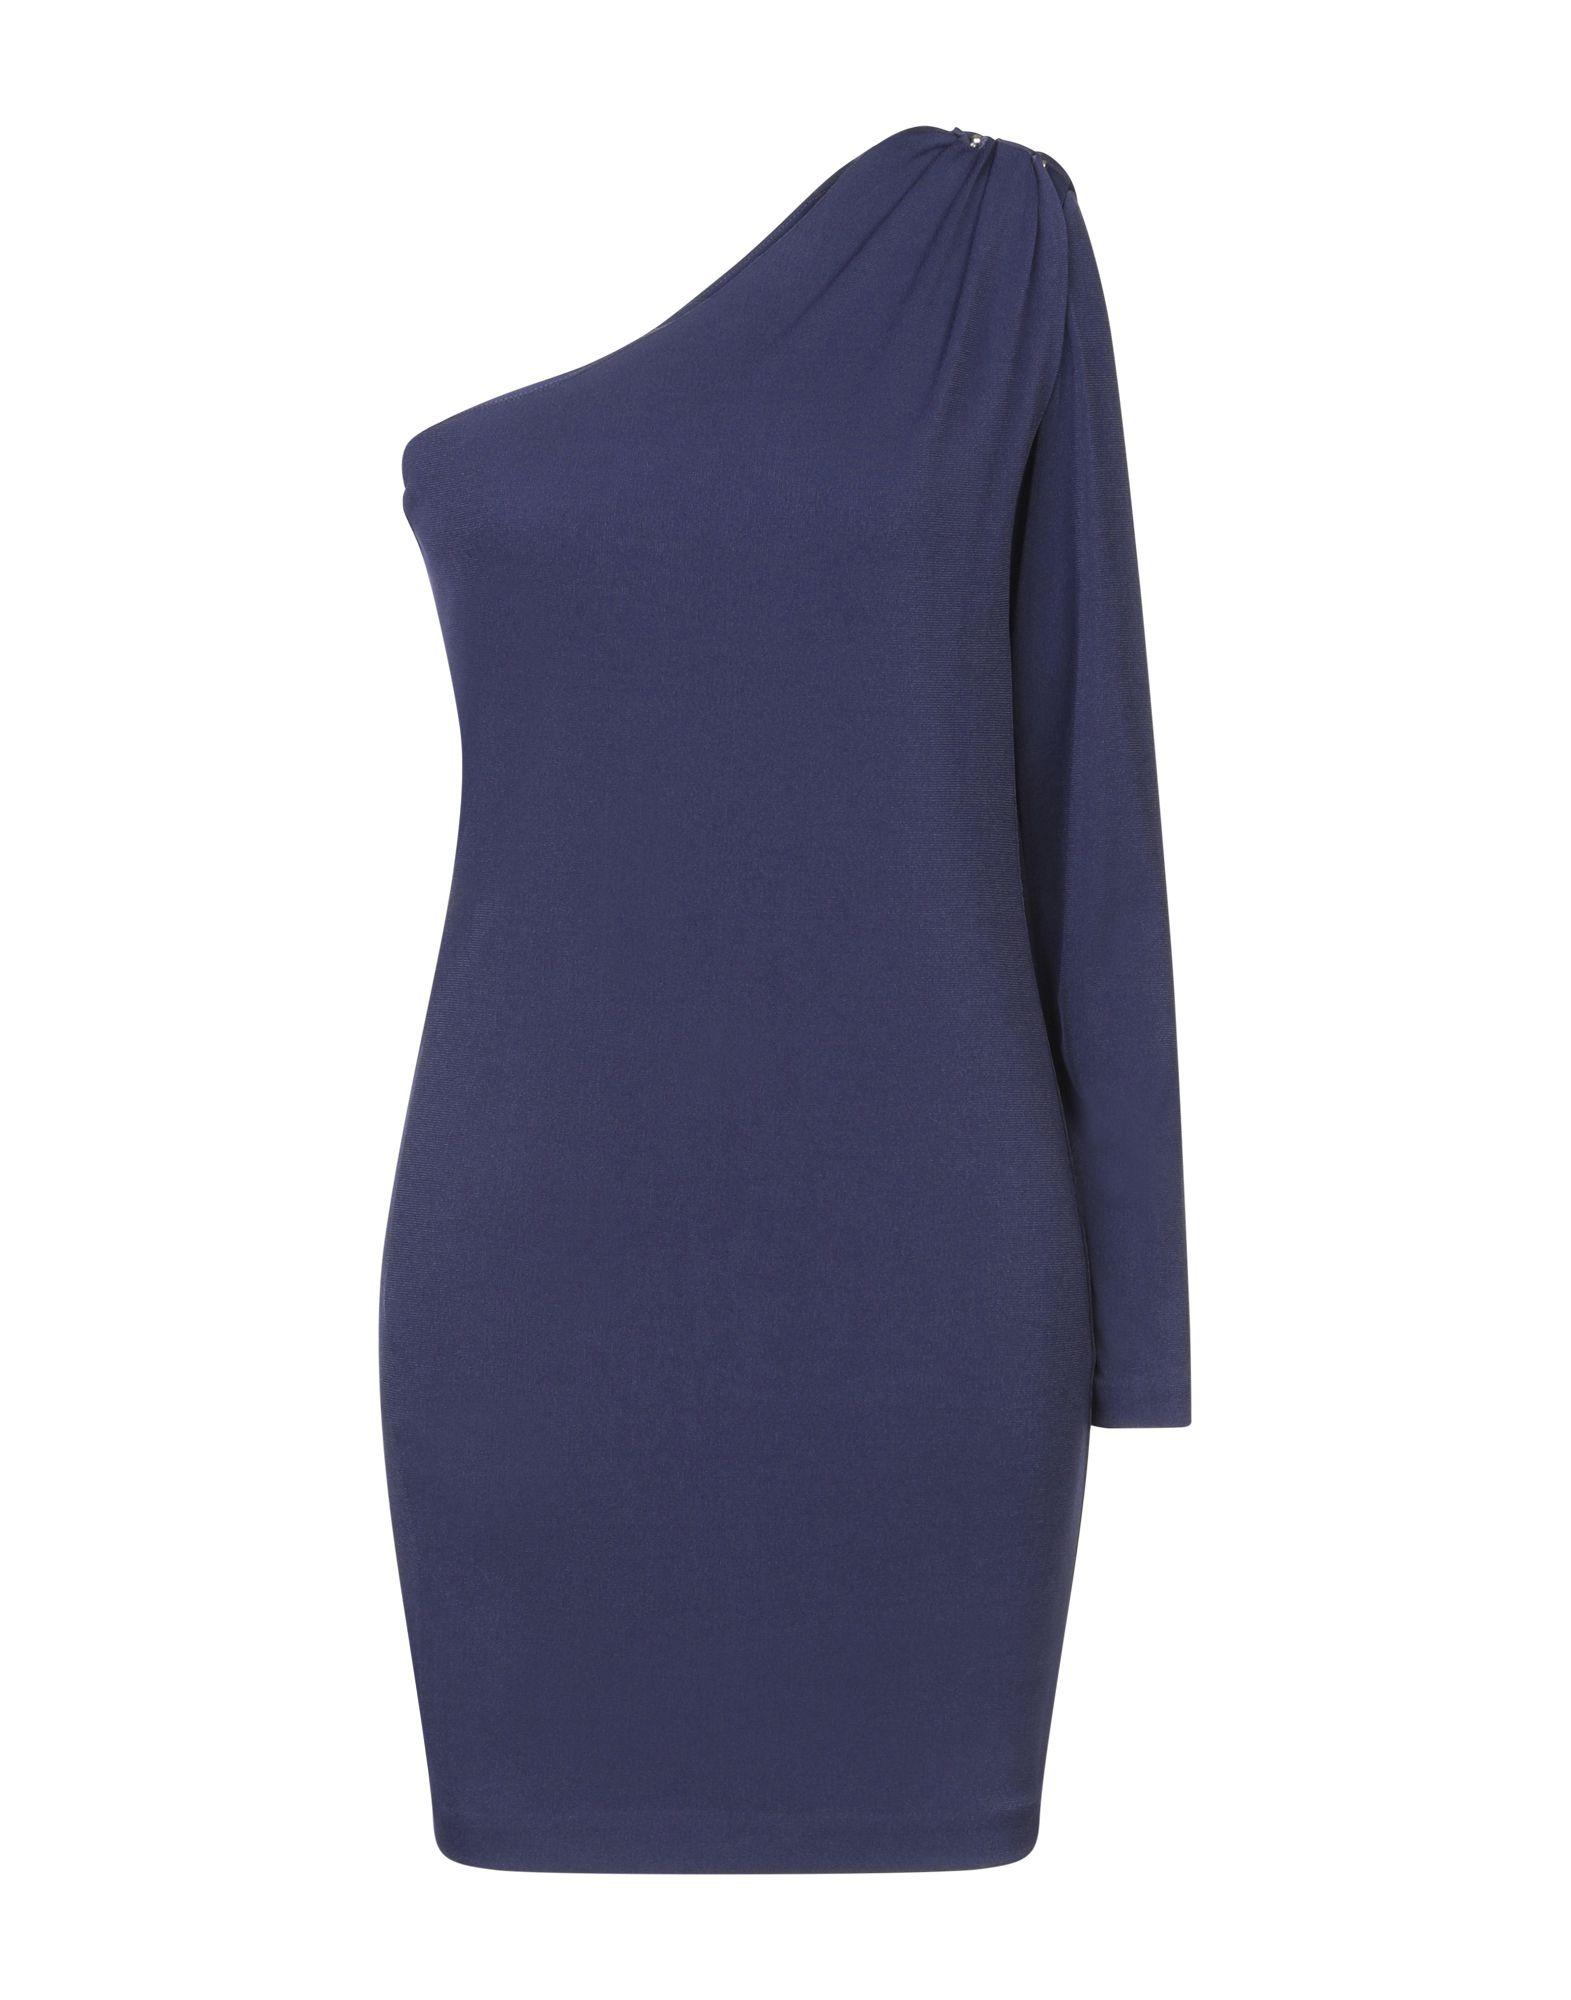 MARCIANO Короткое платье платье коктейльное из одно плечо